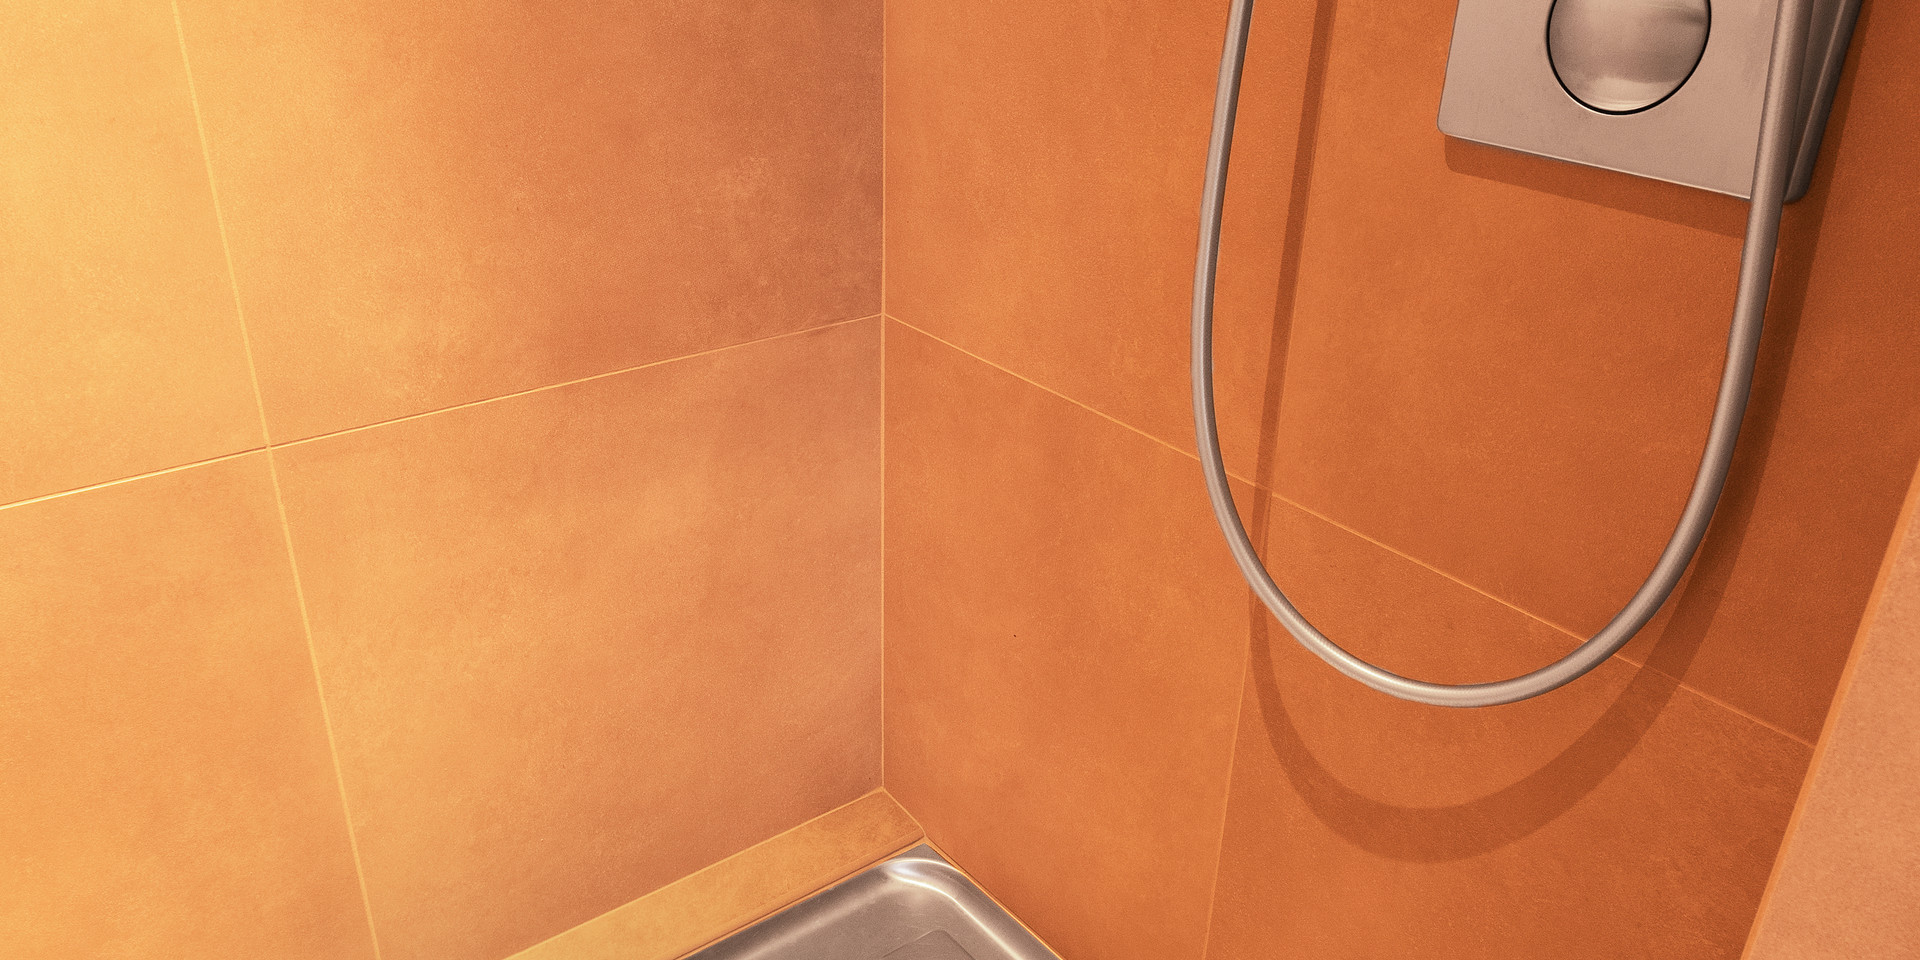 gay-sauna-renos-relax-club-shower